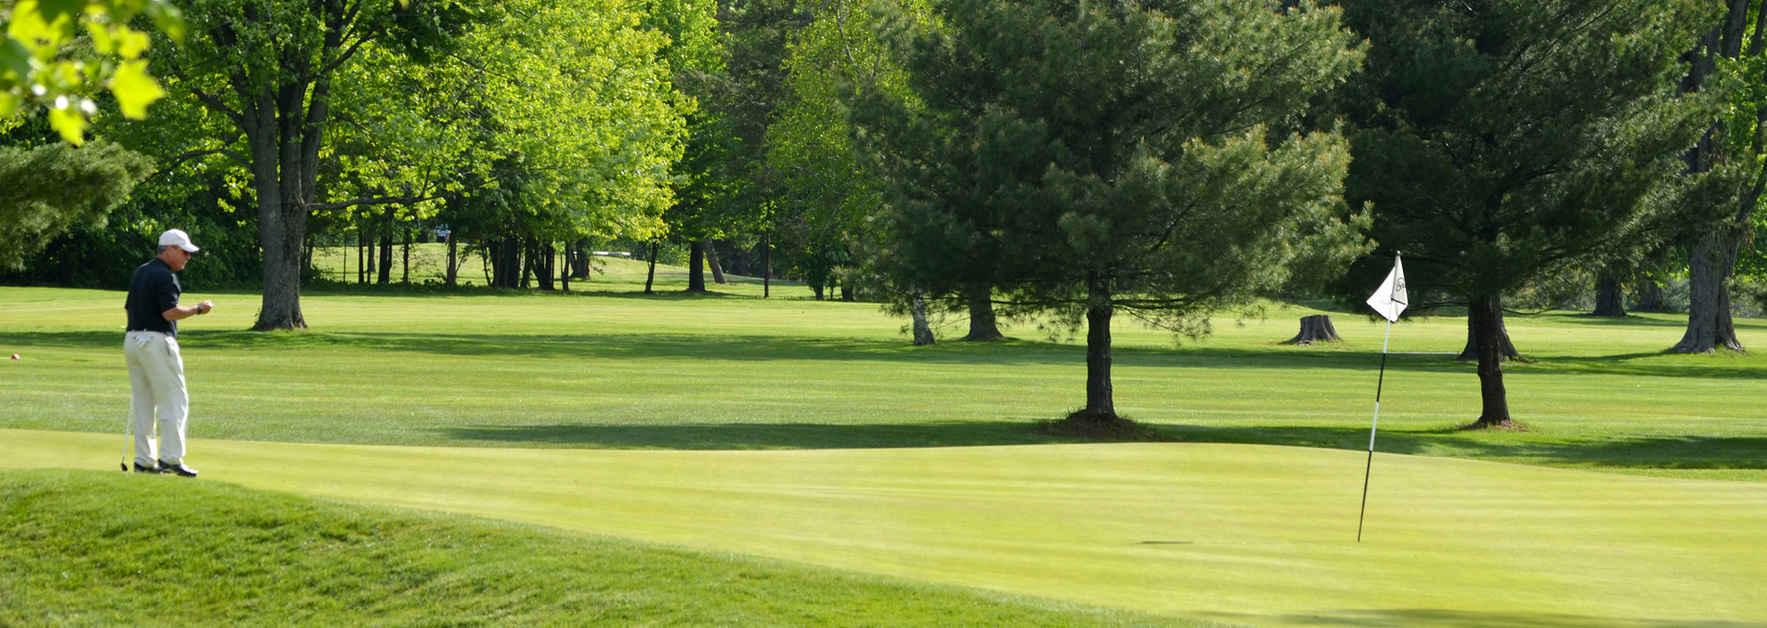 27th Annual Golf Tournament  image